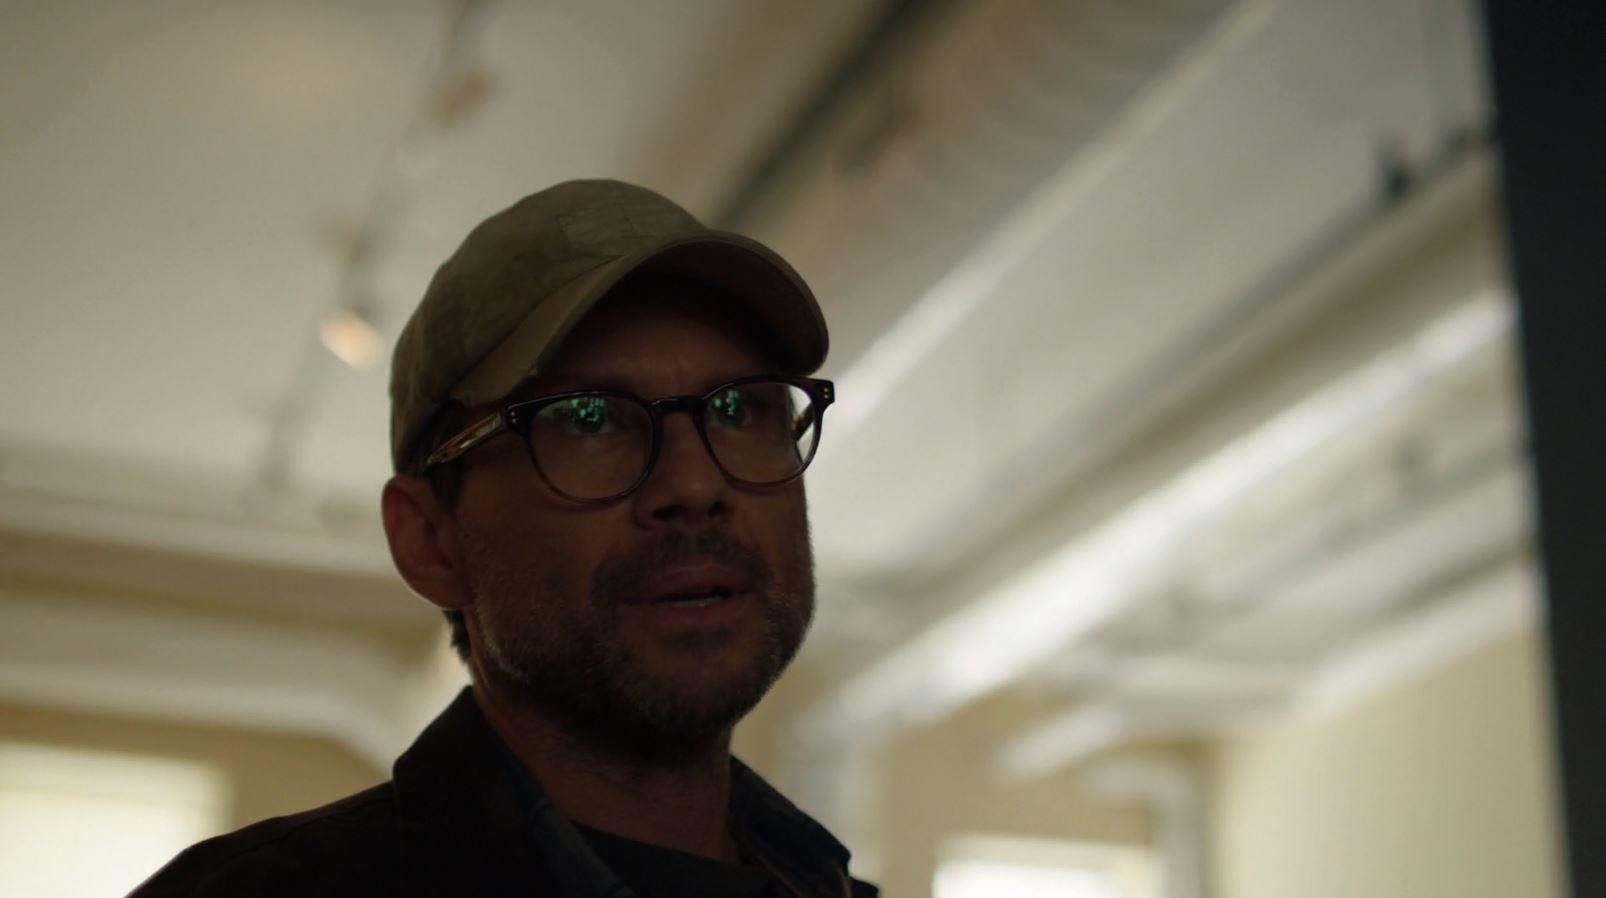 Christian Slater as Mr Robot - Mr. Robot Season Finale Review